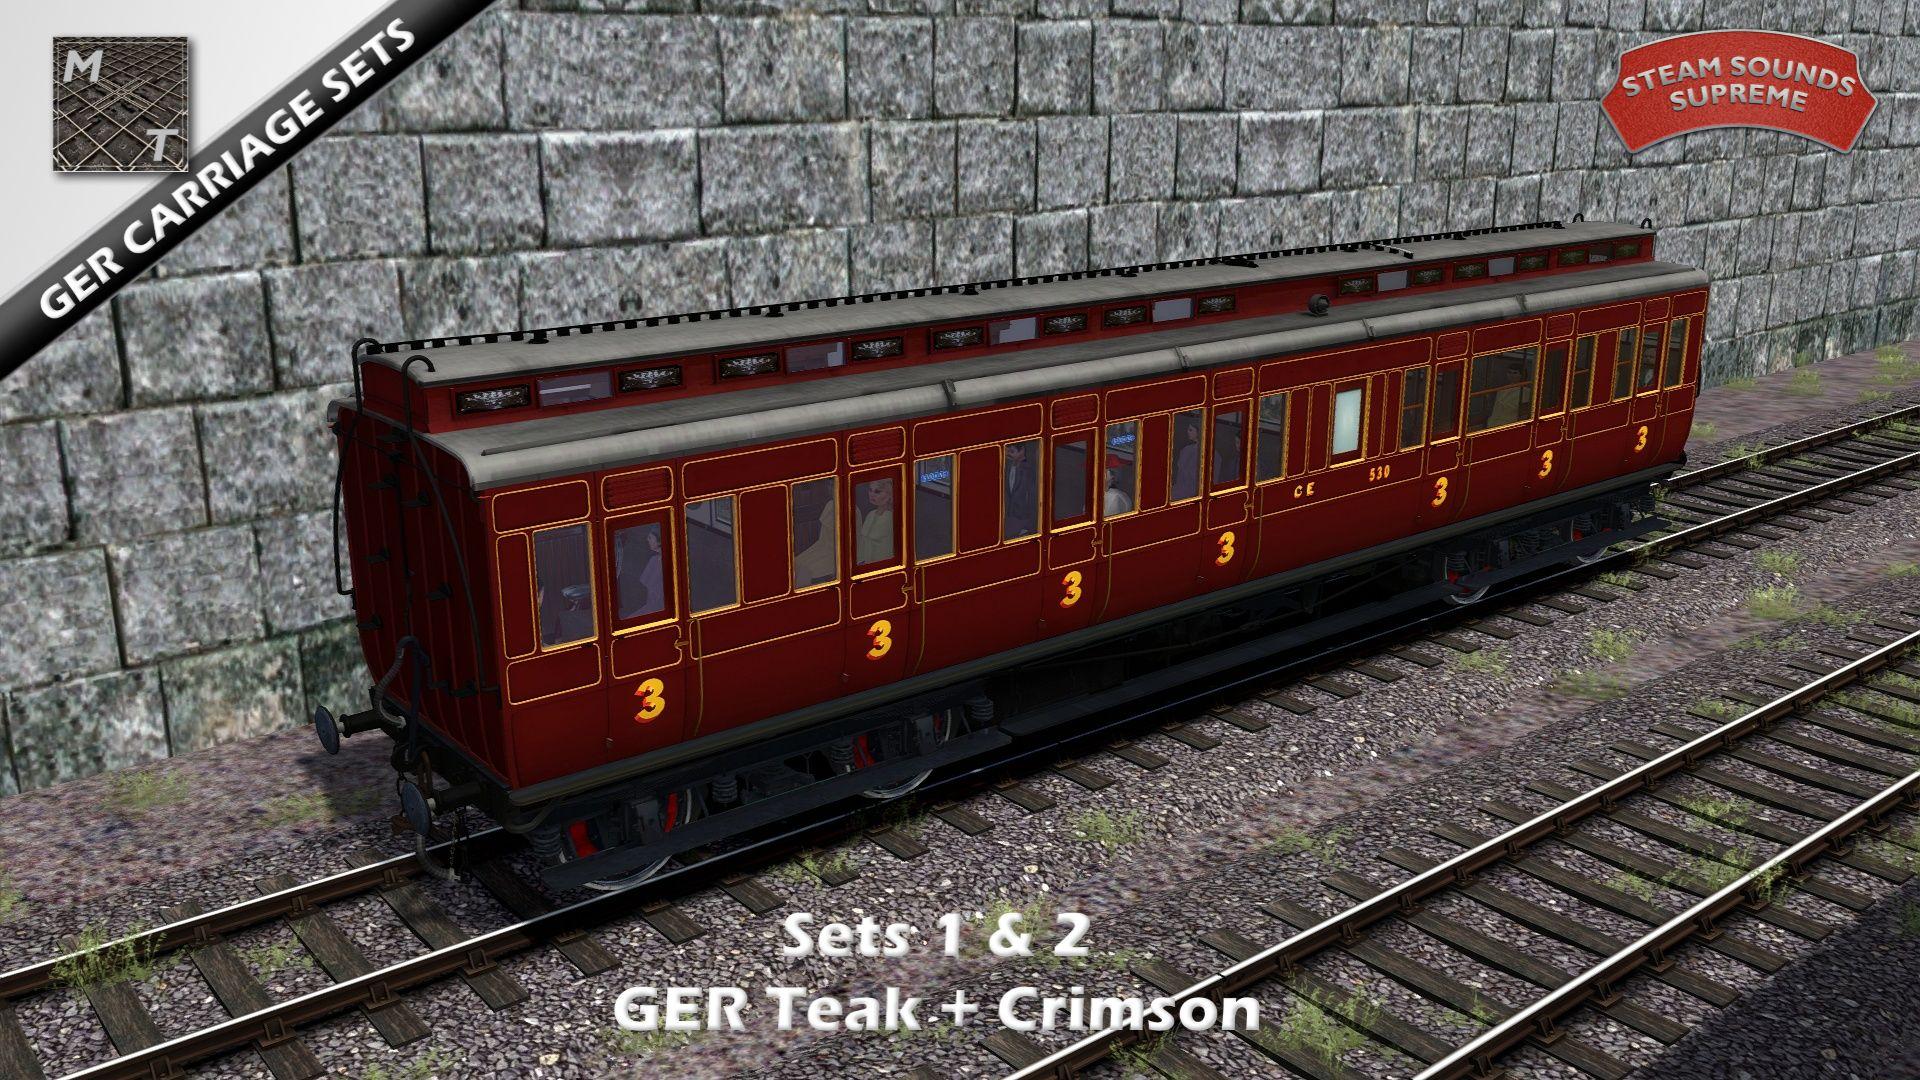 GERCorrSet1-2_24.jpg